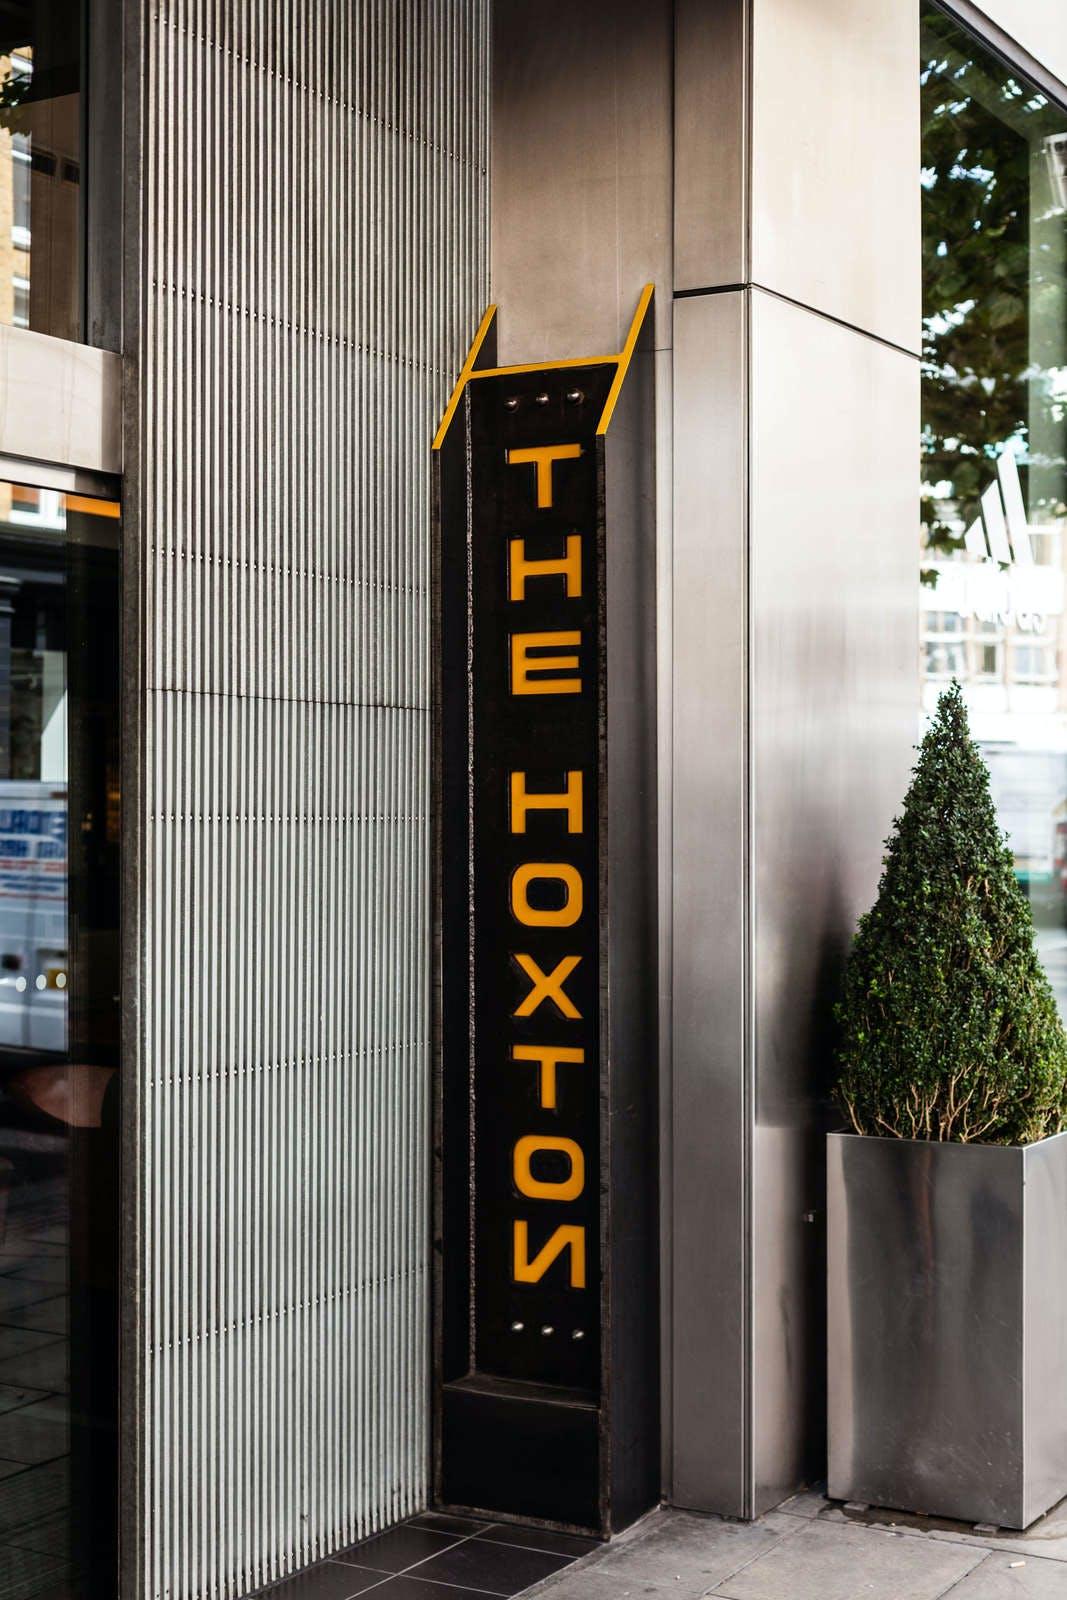 The Hoxton Shoreditch